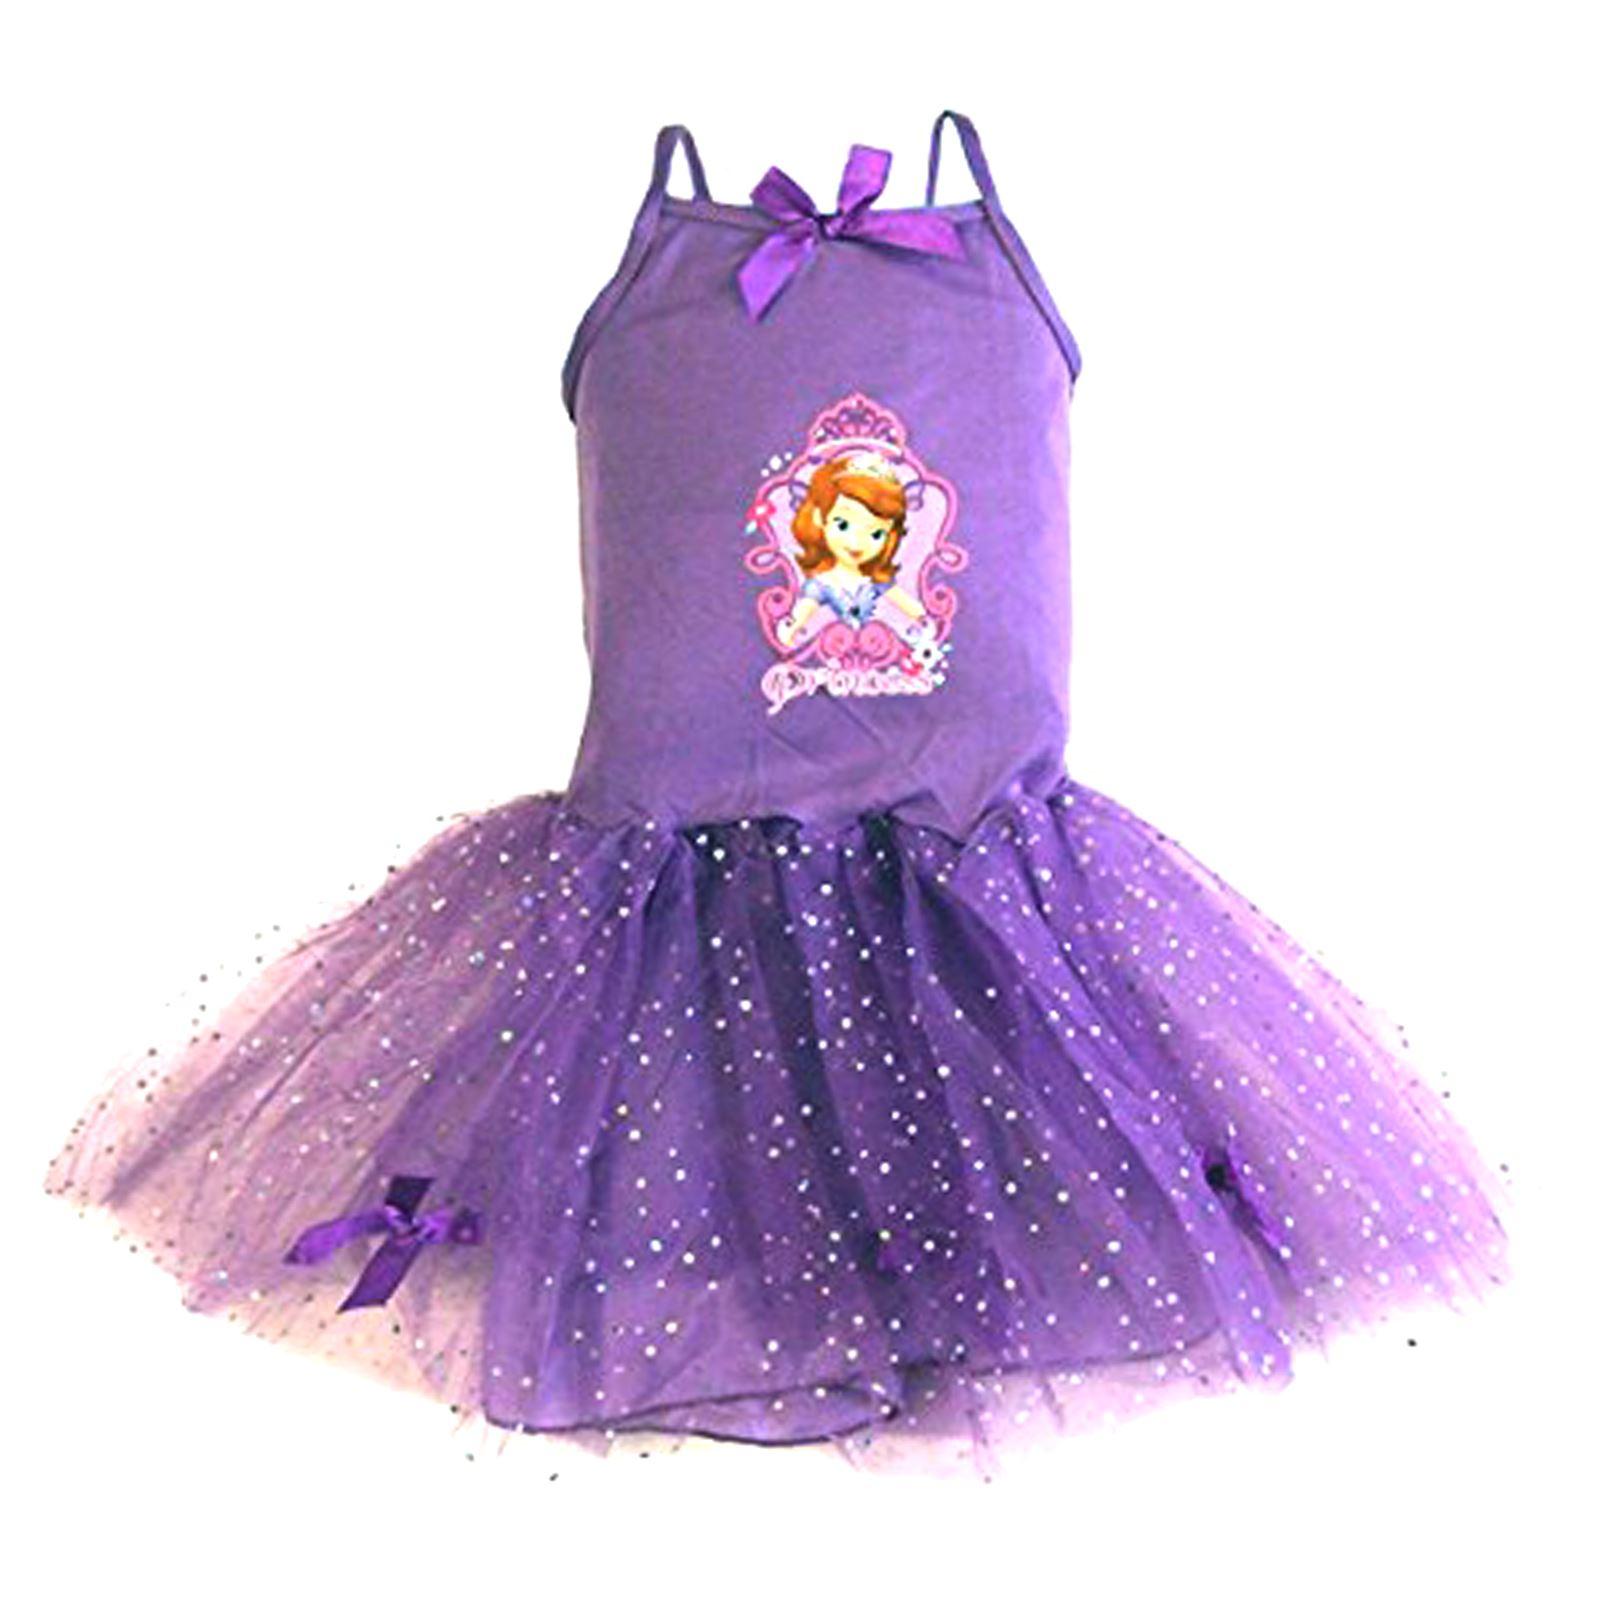 PRINCESS-SOFIA-THE-FIRST-PEPPA-PIG-Disney-Dress-  sc 1 st  eBay & PRINCESS SOFIA THE FIRST/ PEPPA PIG - Disney Dress up Fancy Dress ...